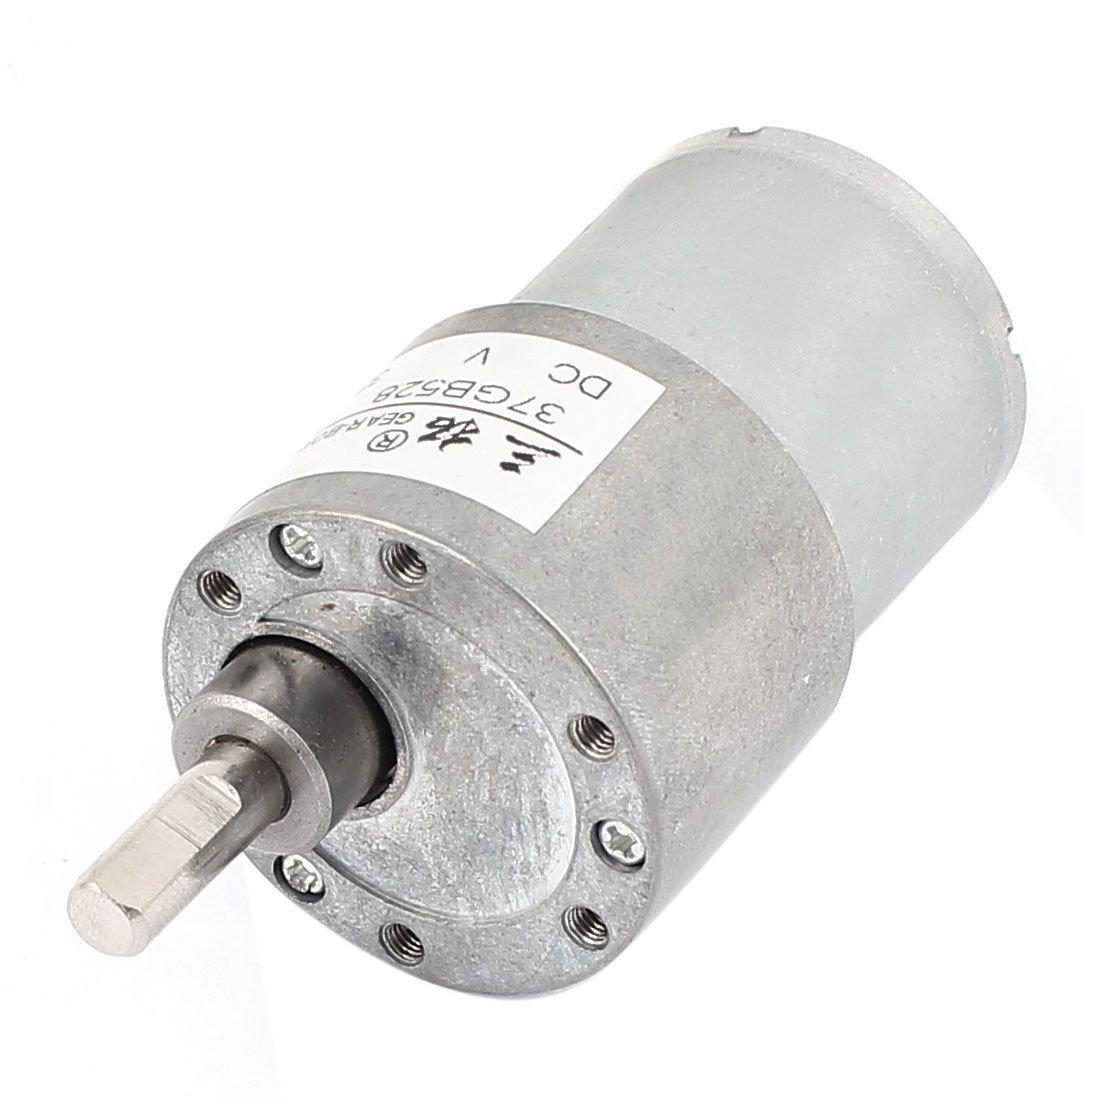 DC 24V 100RPM 1.4KG.cm 37mm Diameter DC Gear Box Reducer Variable Speed Motor